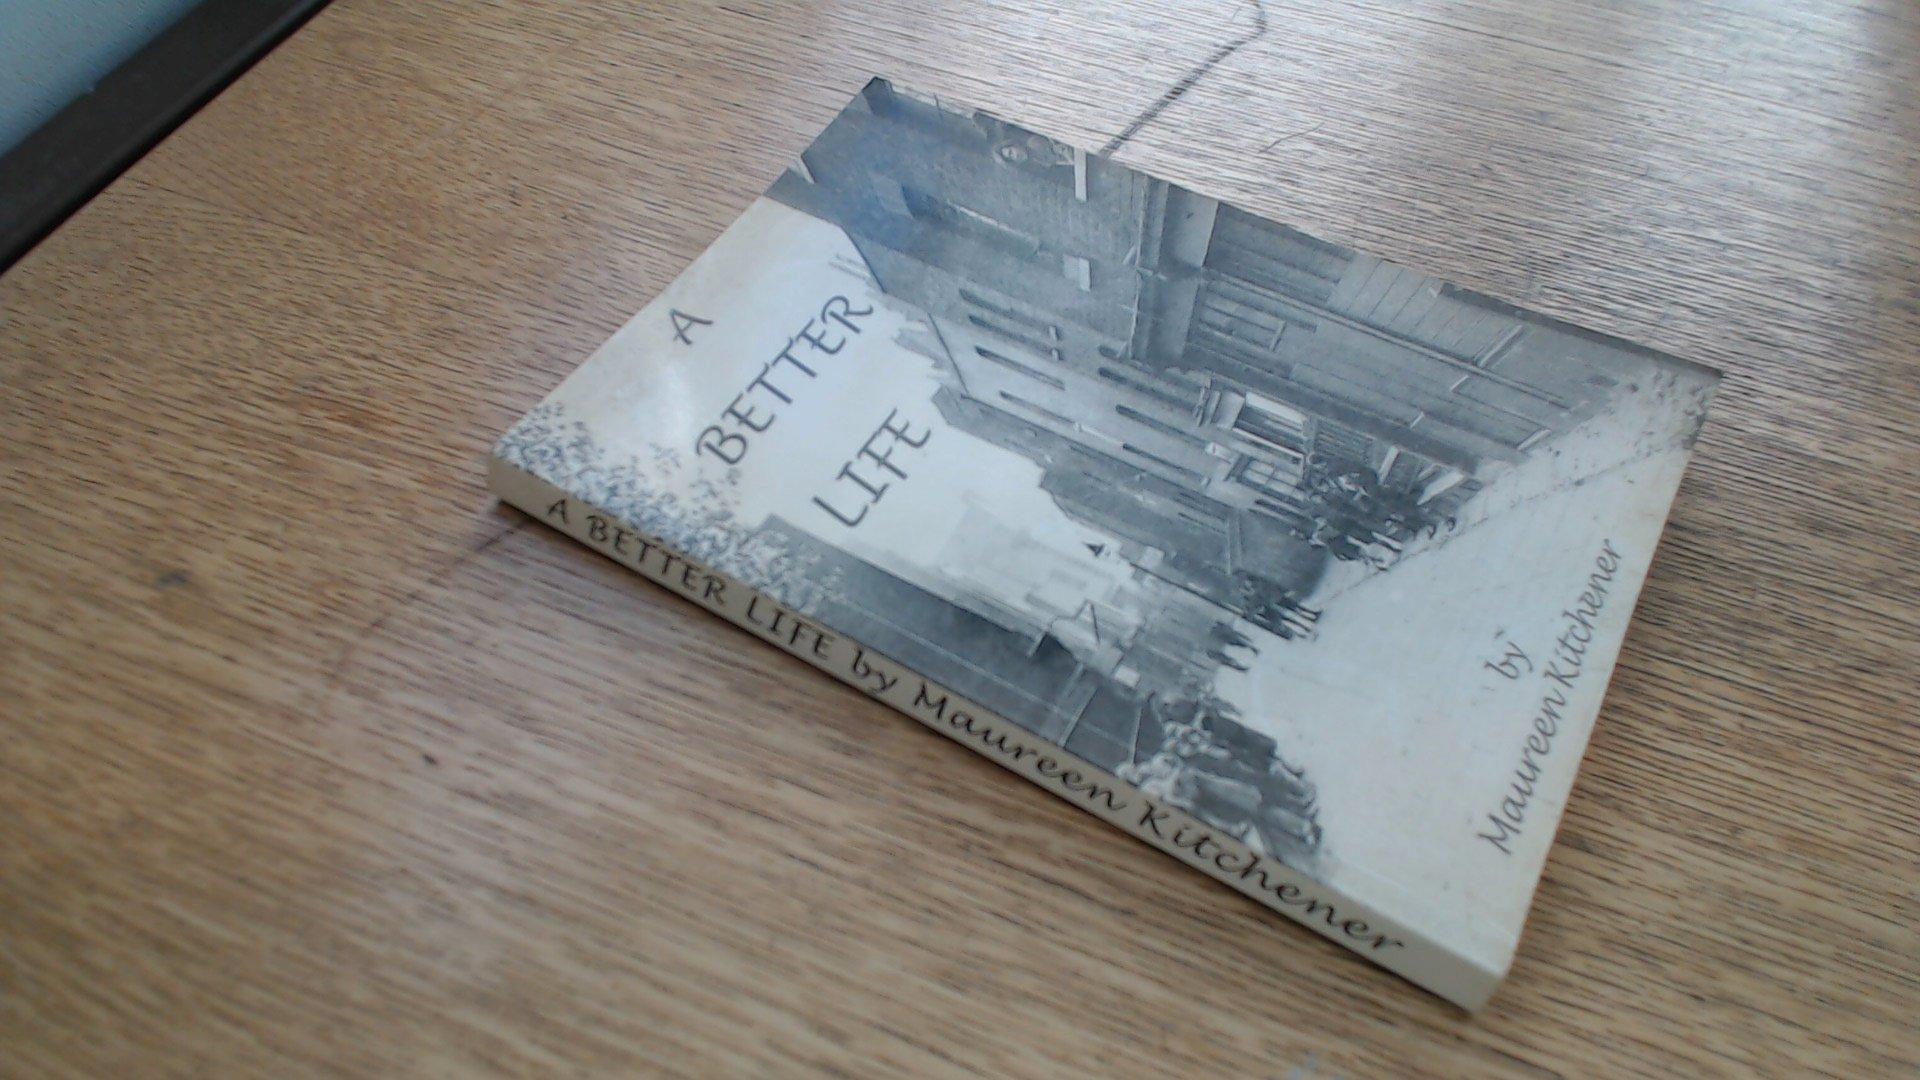 A Better Life: Amazon.co.uk: Maureen Kitchener: Books